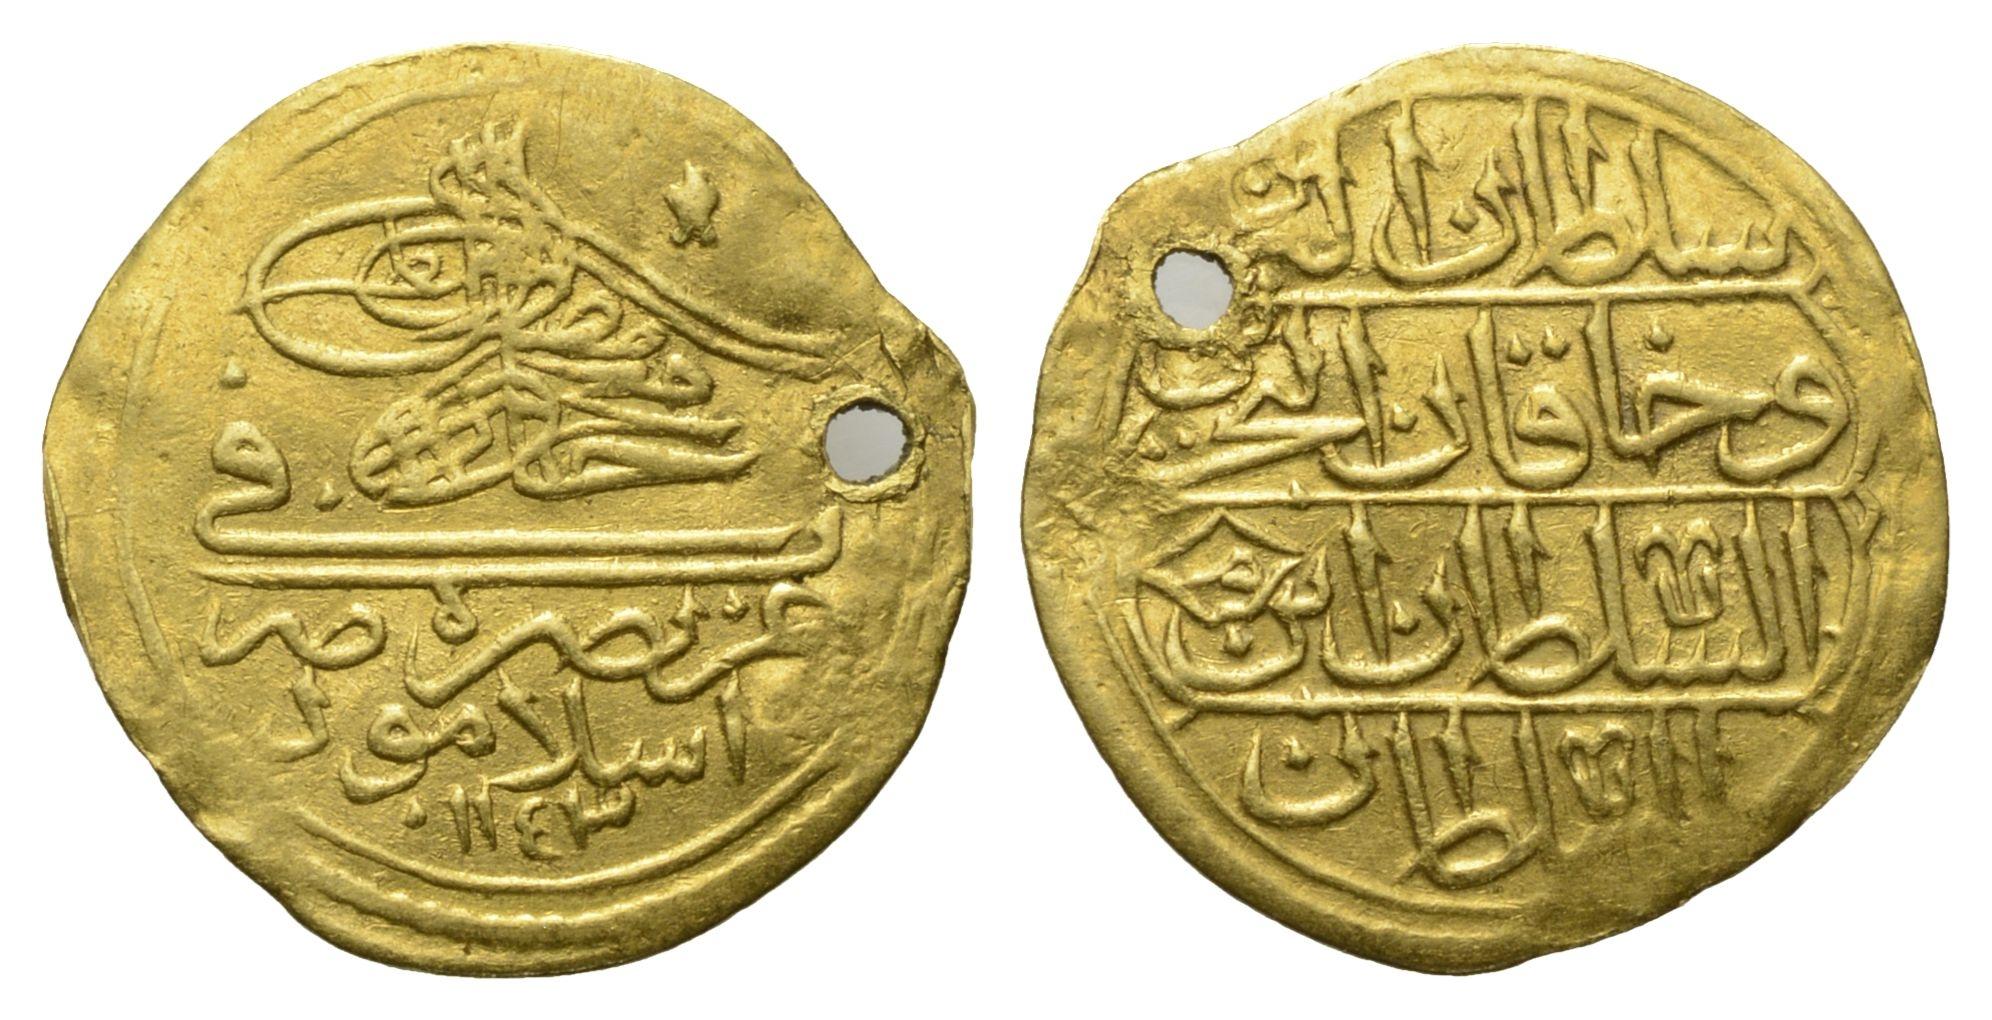 Abdul Hamid//Rare Genuine Islamic silver para coin//Ottoman//Turkey Istambul year 6